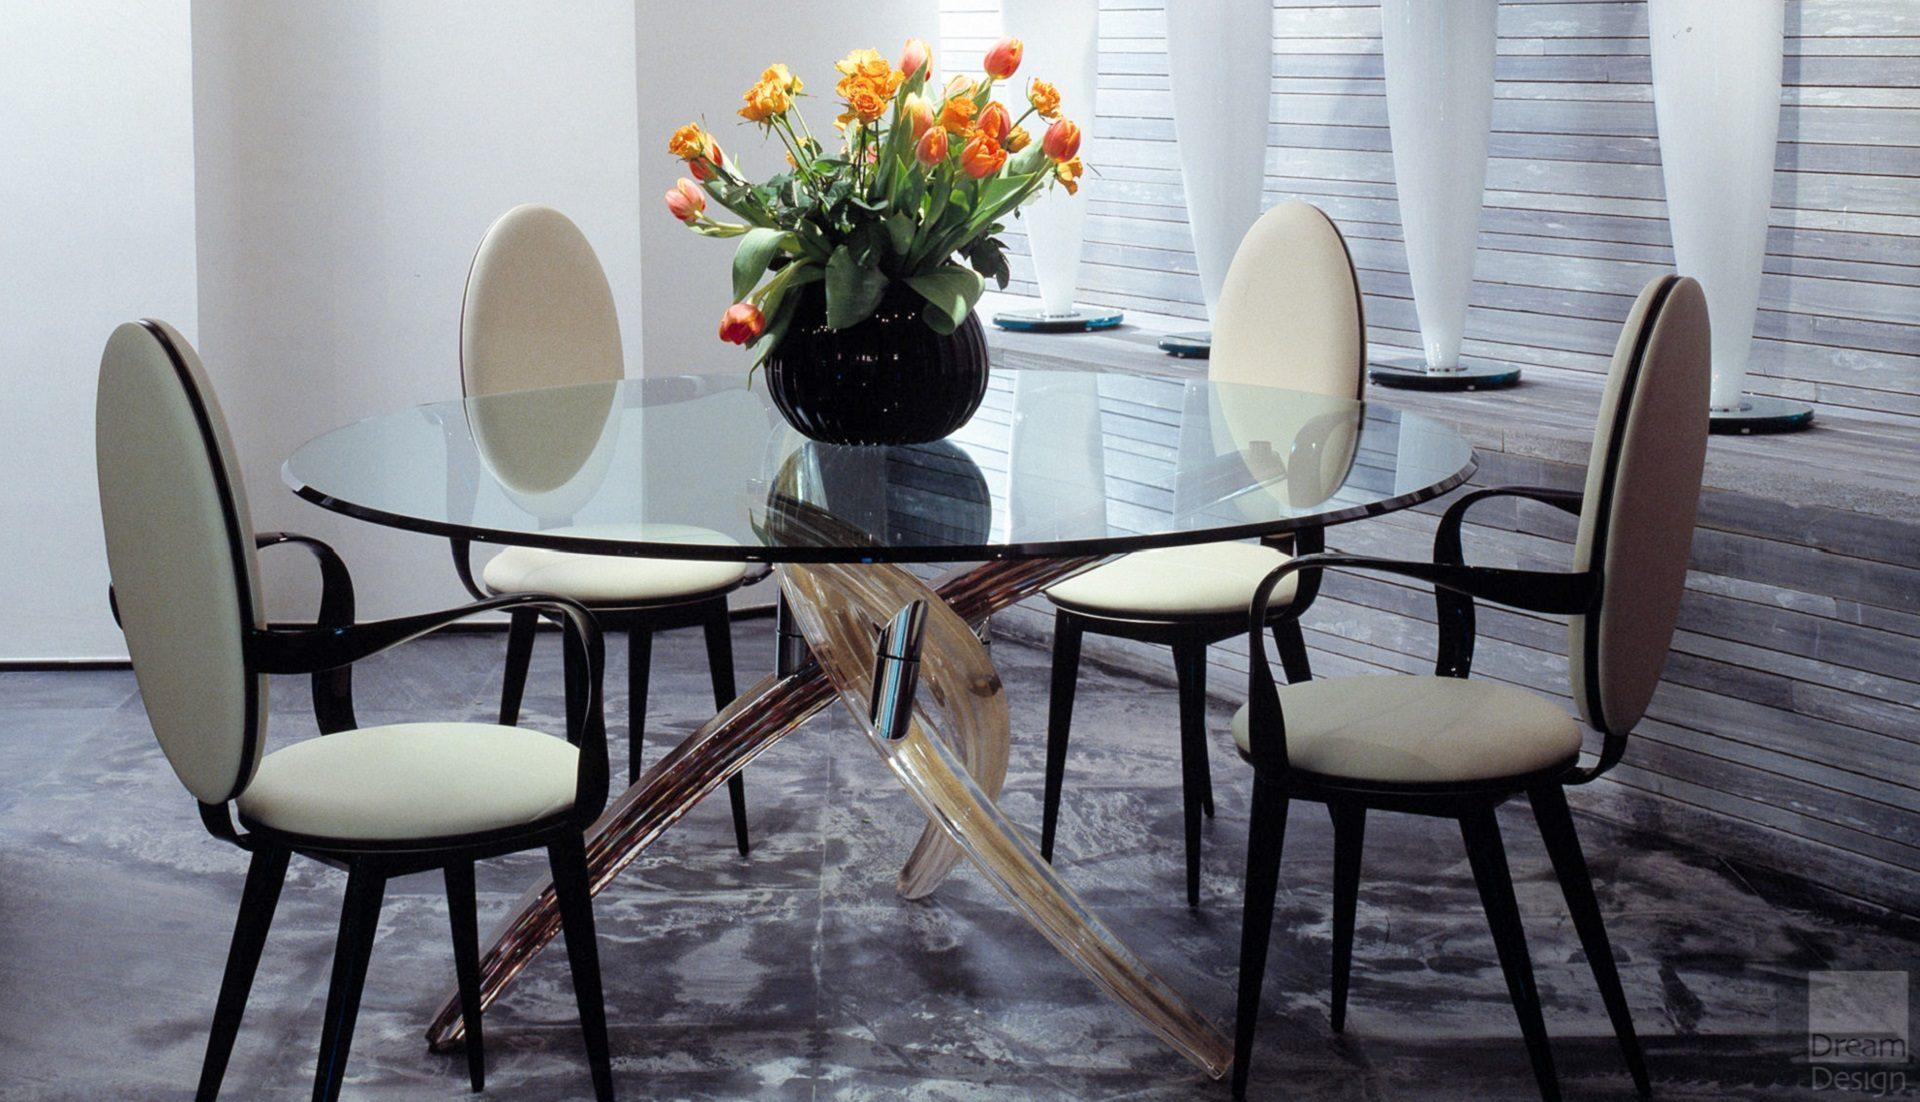 Reflex Angelo Fili D'erba Table